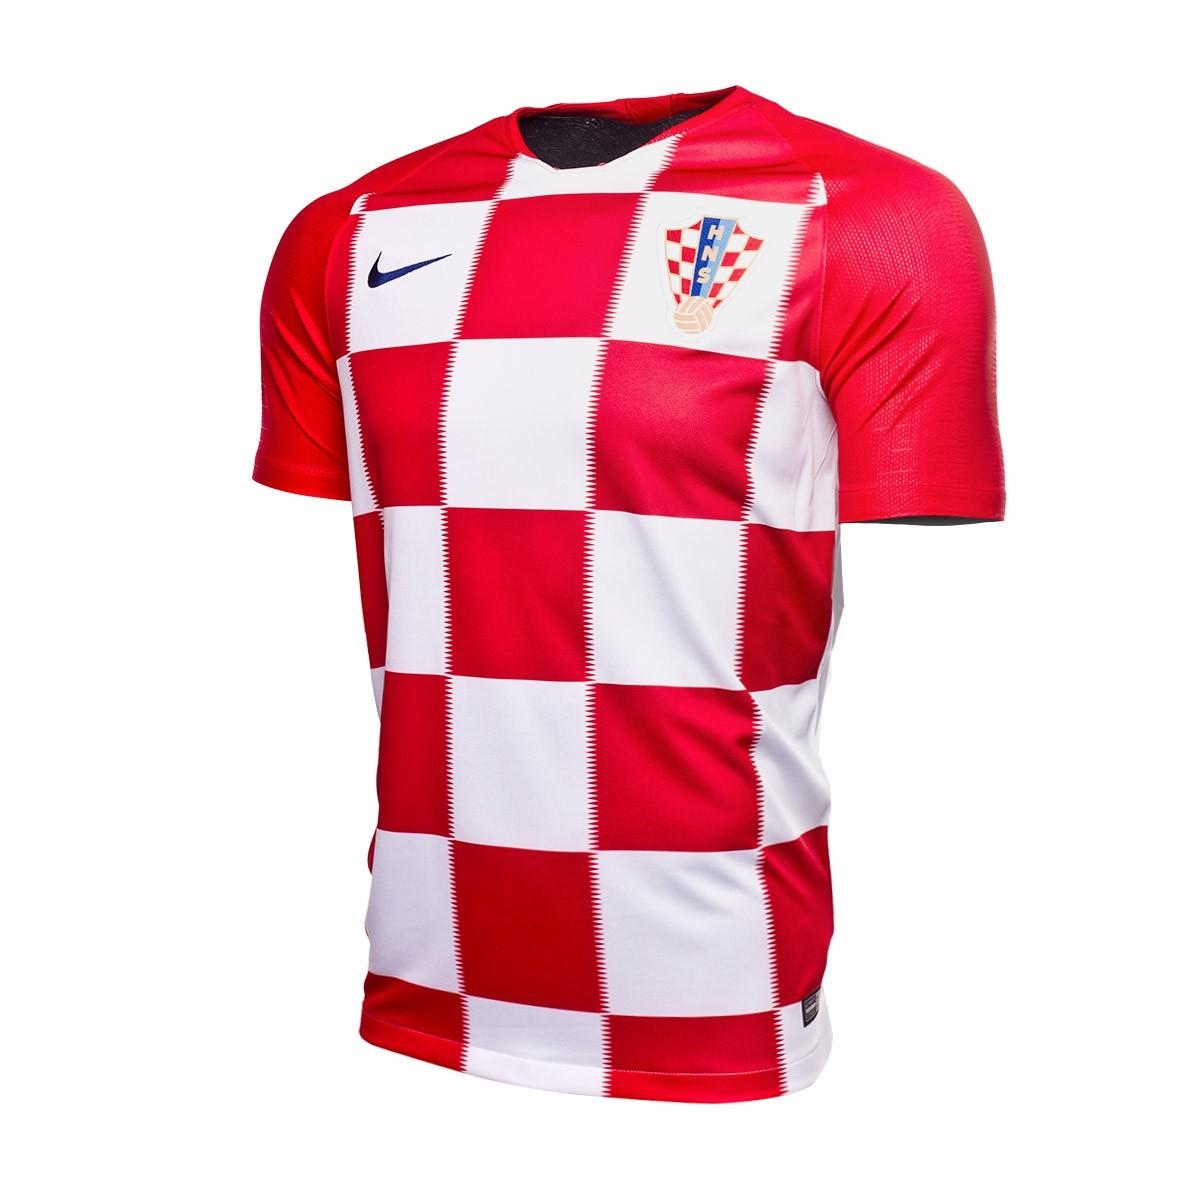 a837b3581095 Jersey Nike Croatia Breathe Stadium 2018-2019 Home Kit University ...